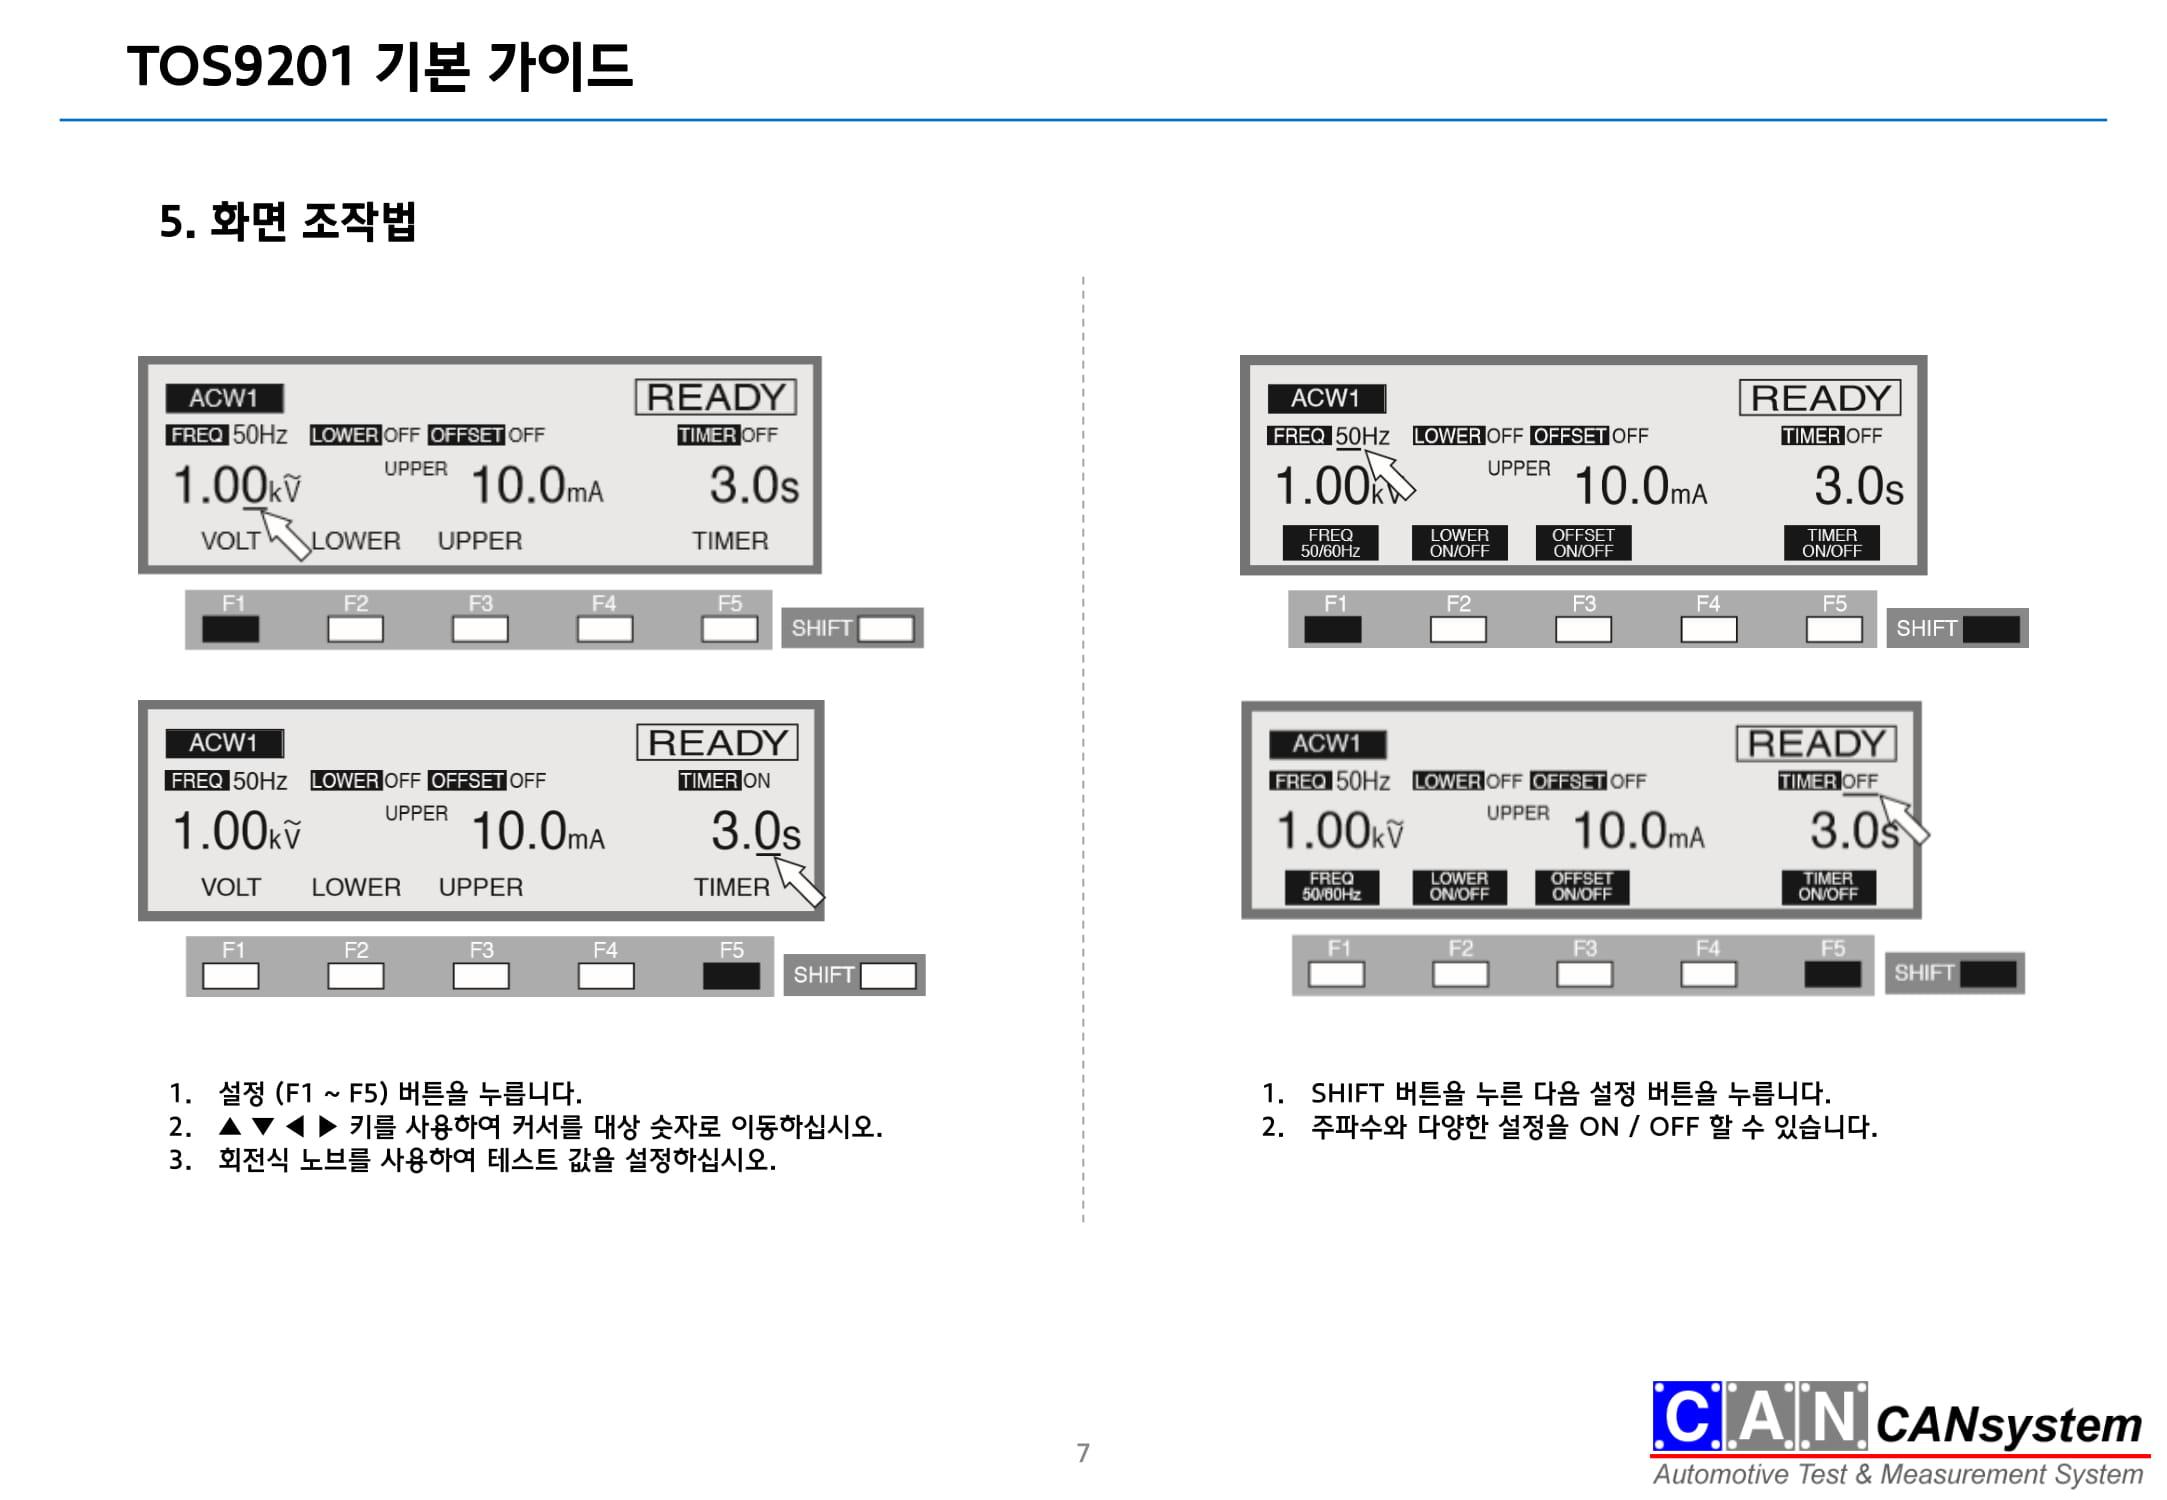 KIKUSUI TOS9201 국문 이용가이드-07.jpg